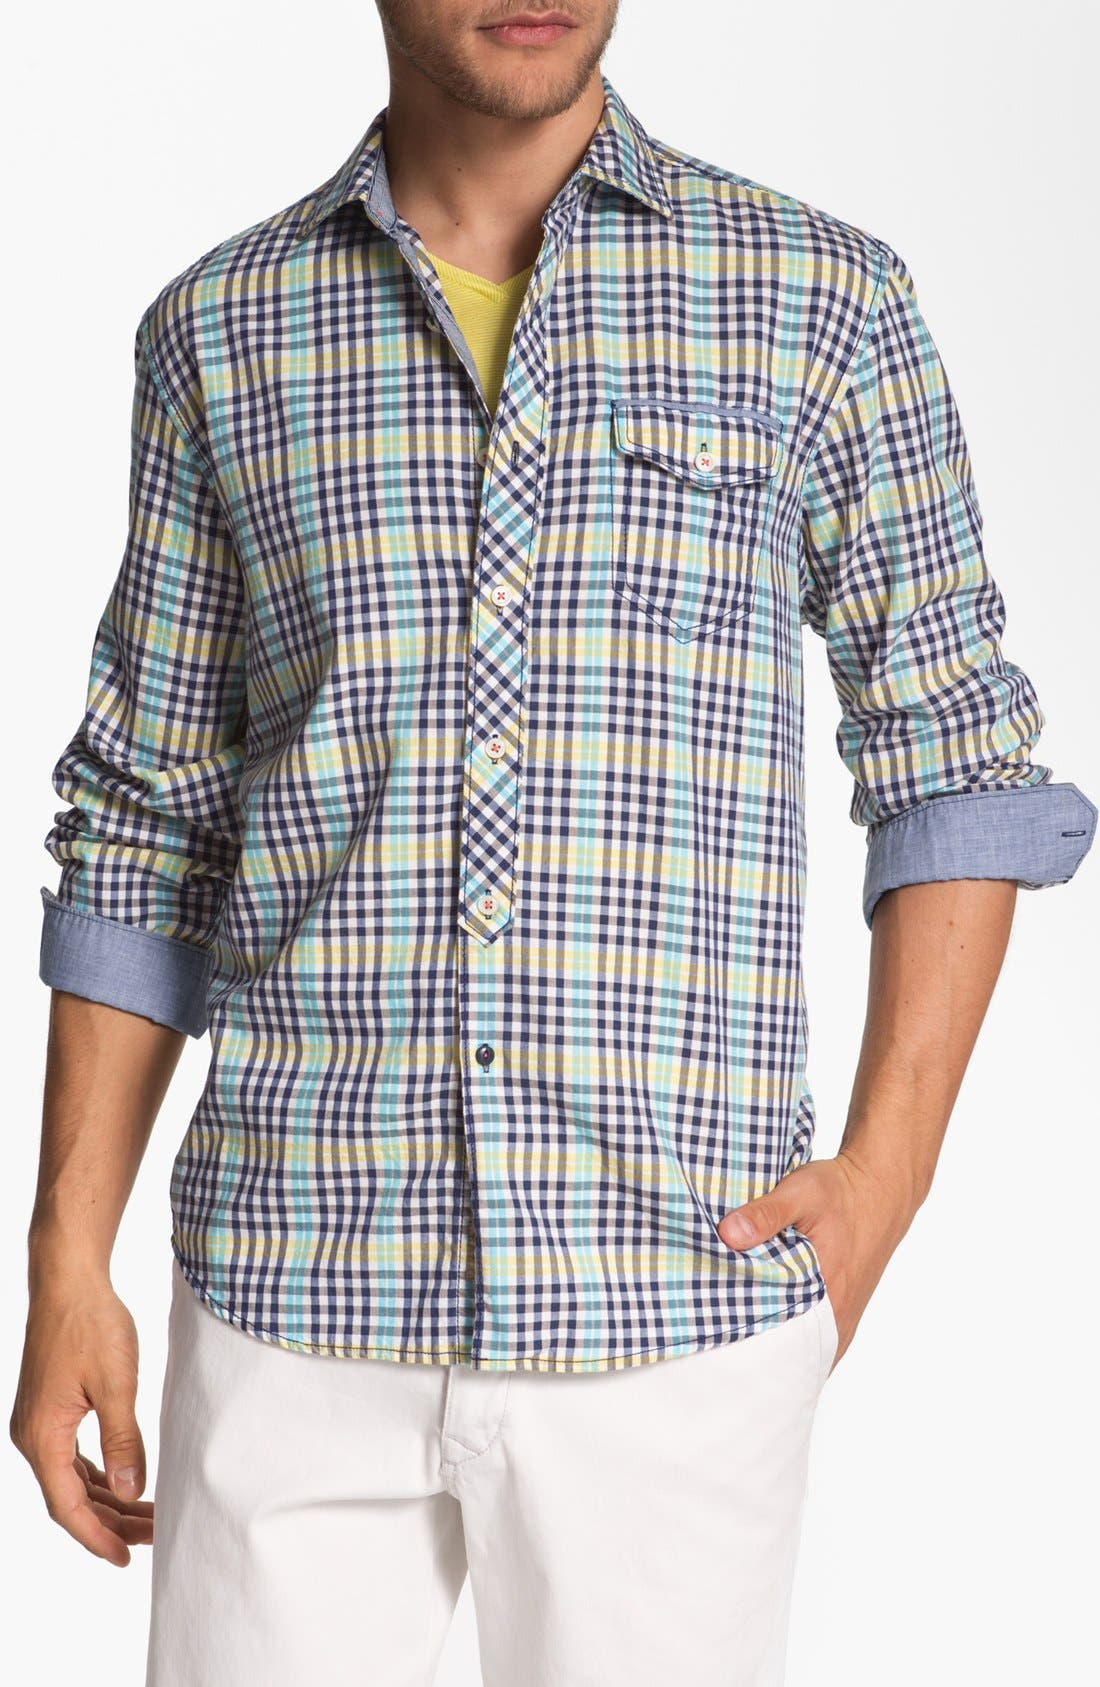 Alternate Image 1 Selected - Tommy Bahama Denim 'Ole Oxford' Regular Fit Sport Shirt